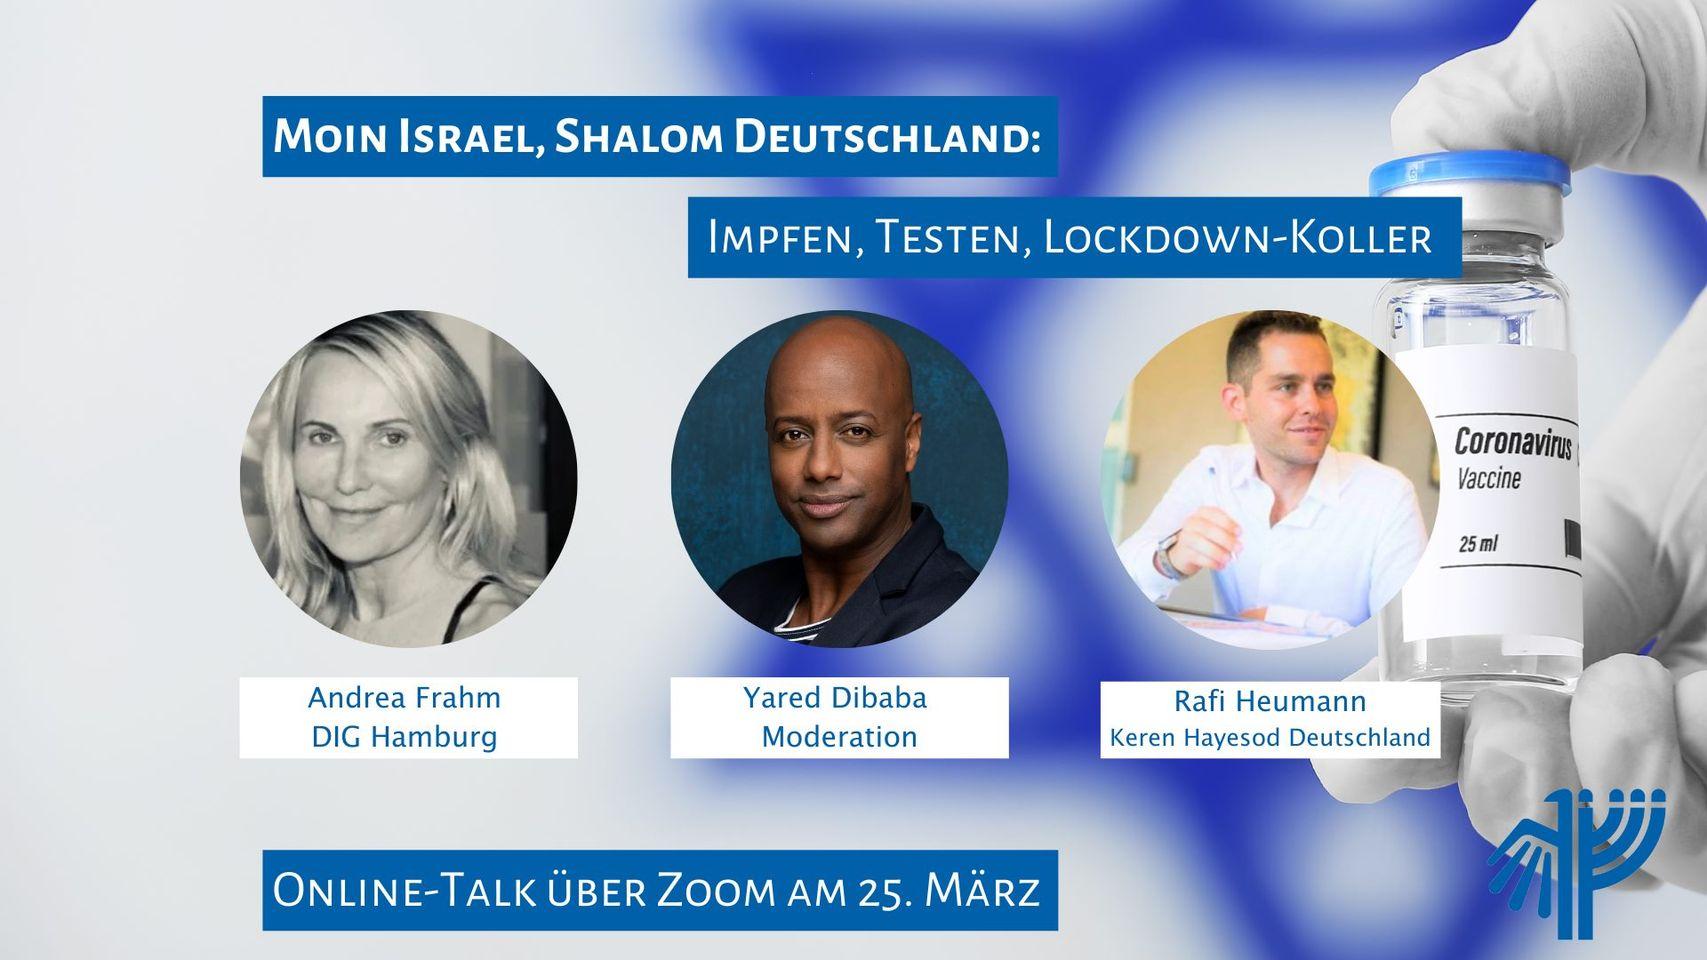 Israel vs. Deutschland: Impfen, Testen, Lockdown-Koller - Moderiert v. Yared Dibaba